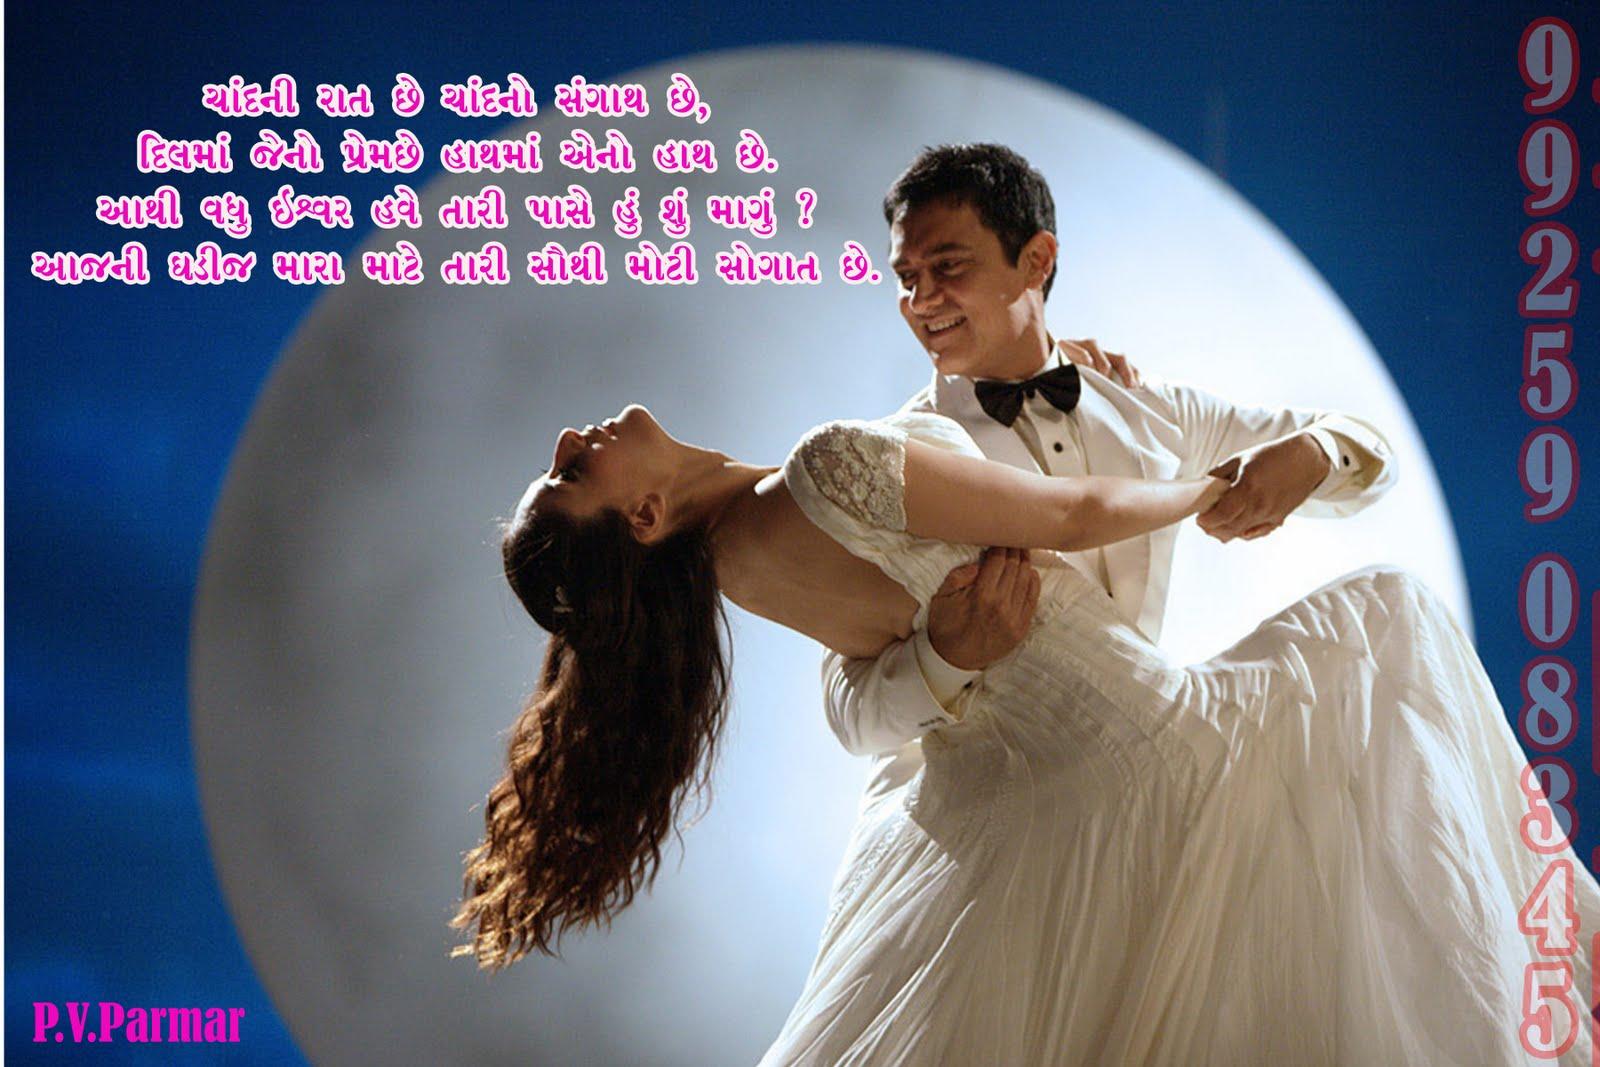 RoyalJatt.Com - Free Download Punjabi Songs,Videos,Hindi